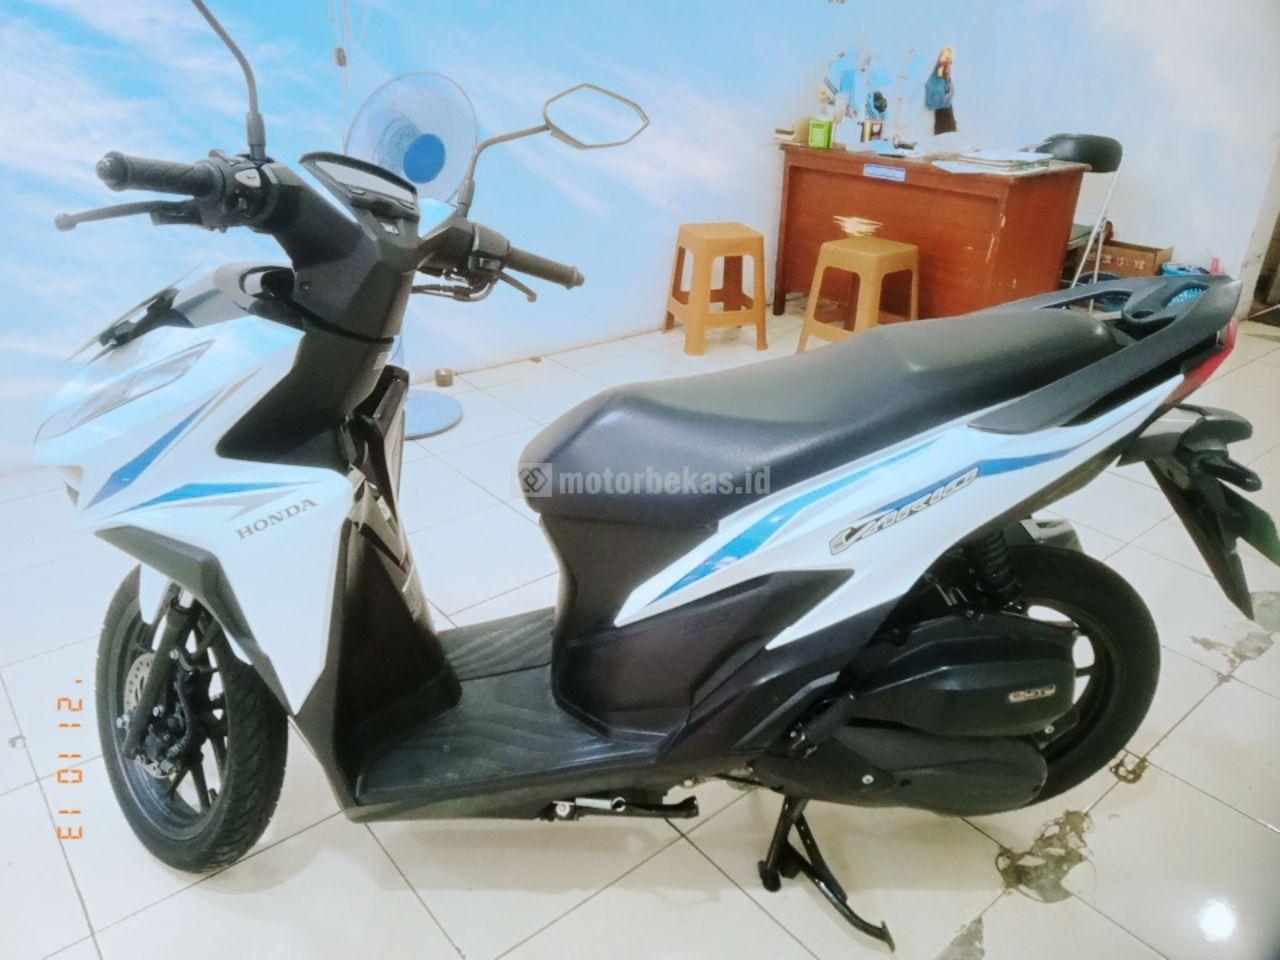 HONDA VARIO 125 FI 2019 motorbekas.id